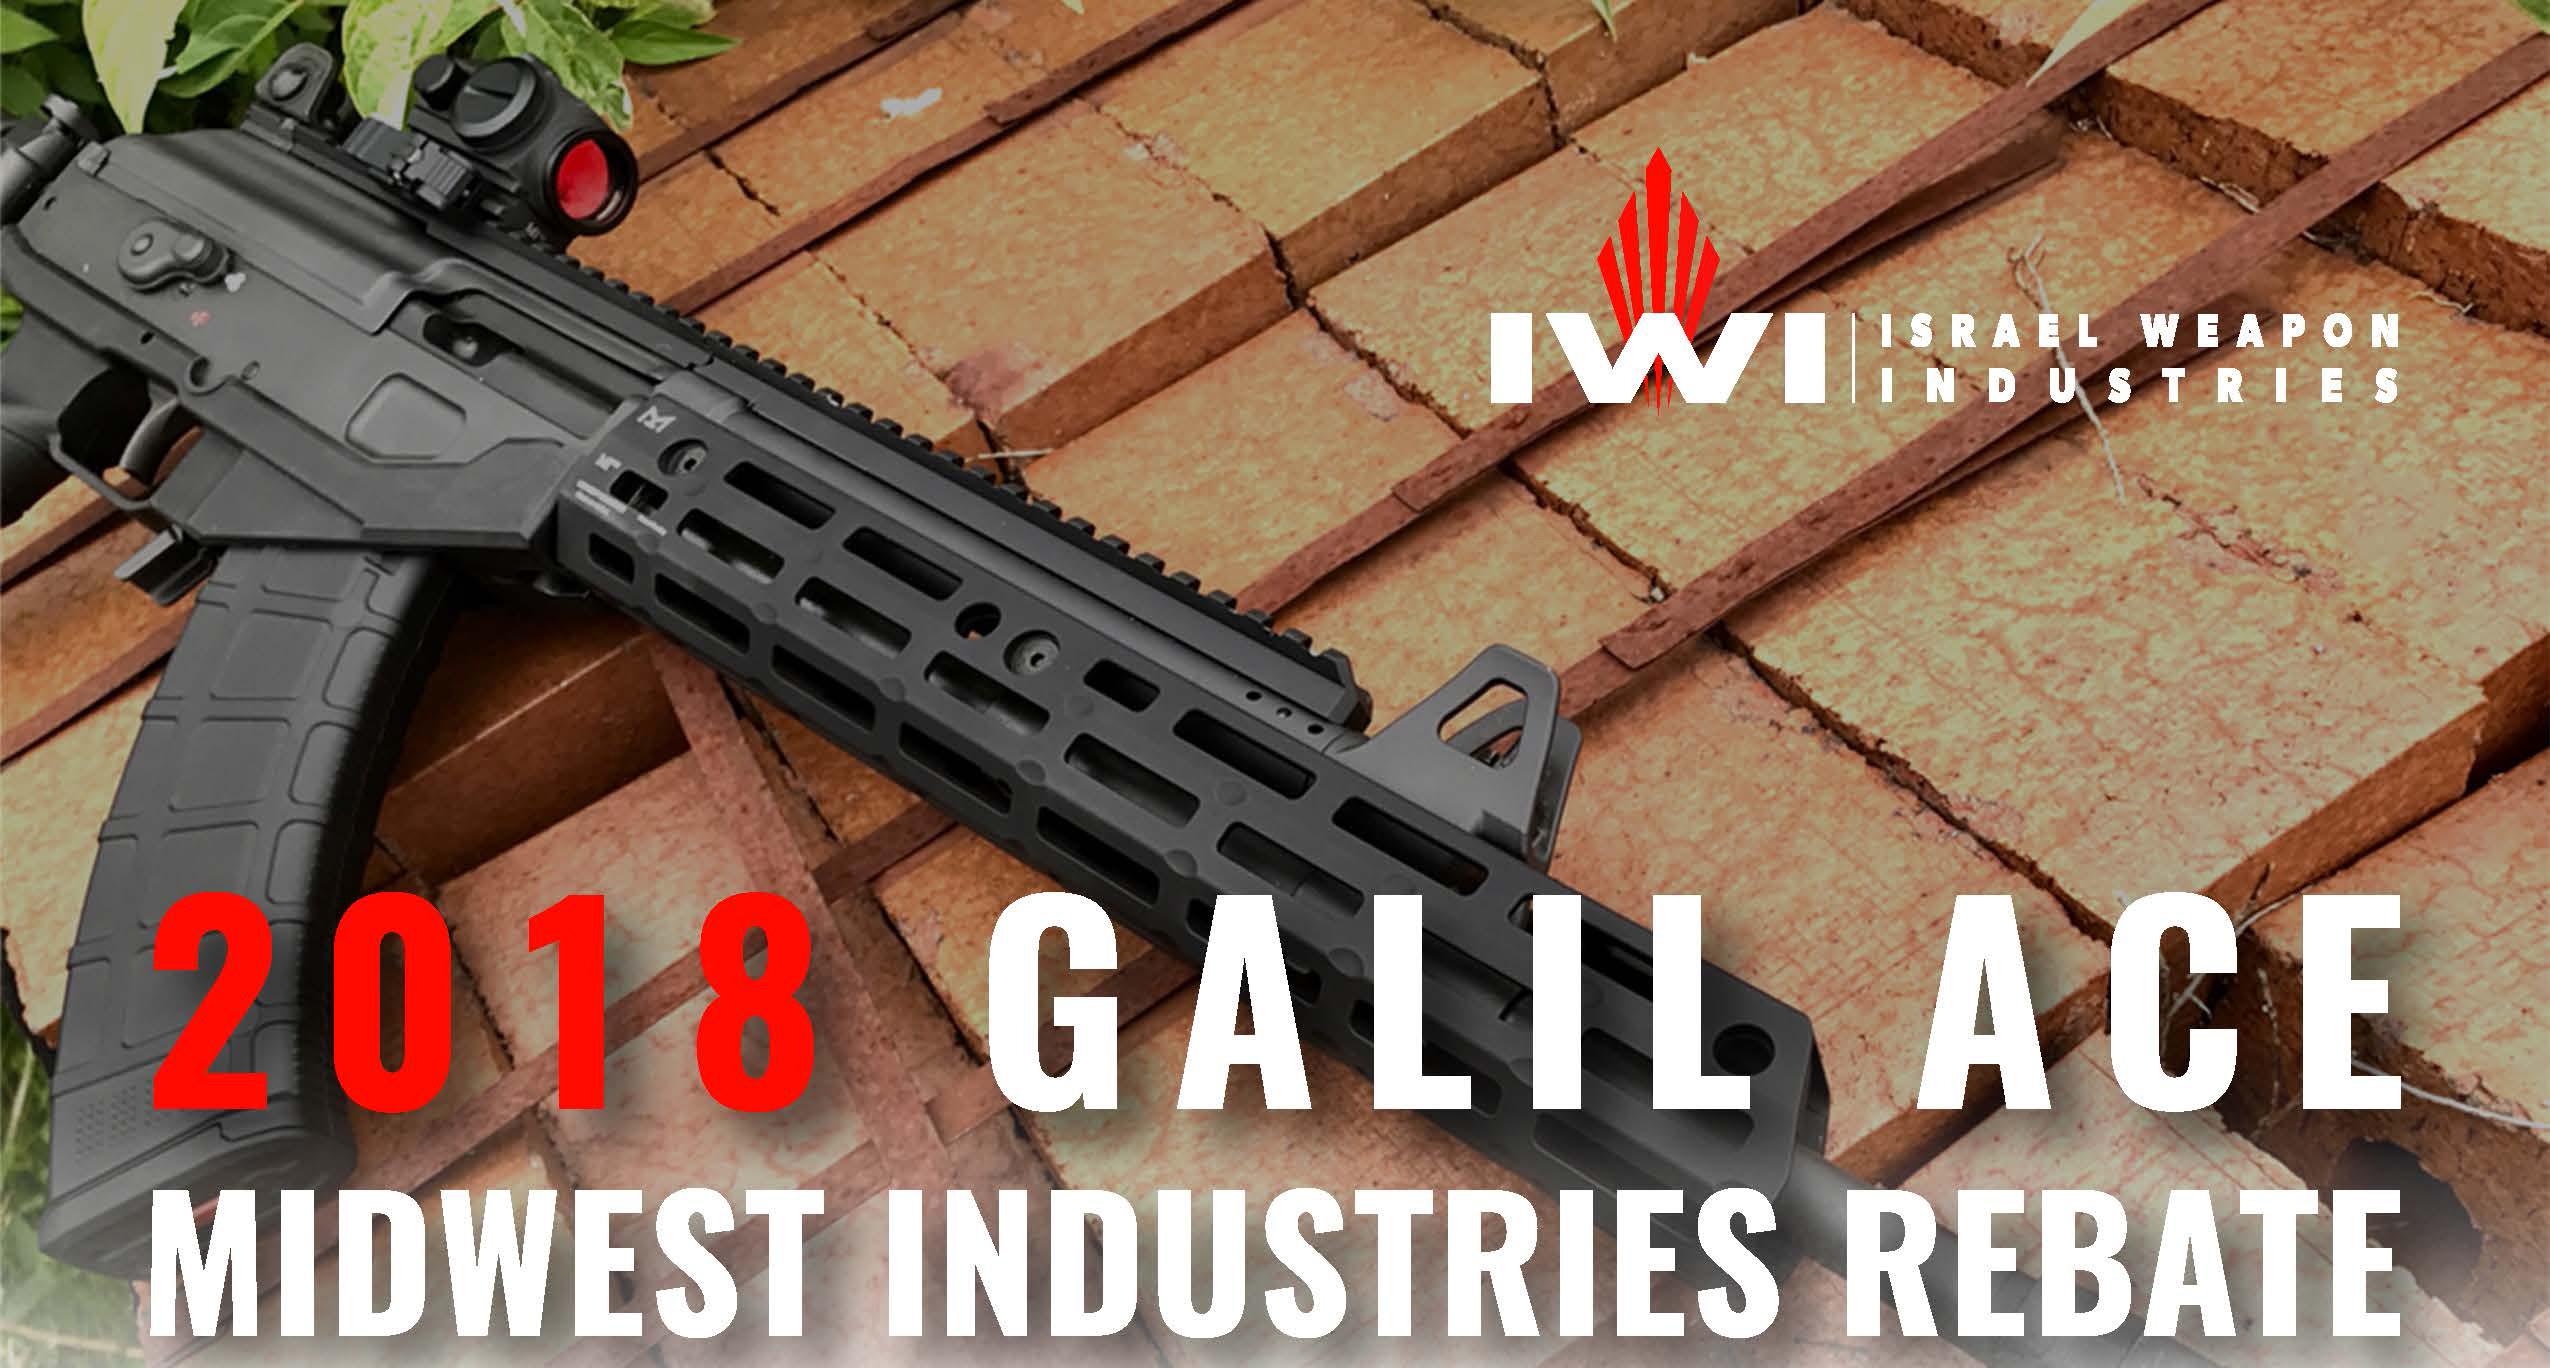 IWI - Galil ACE Promotion